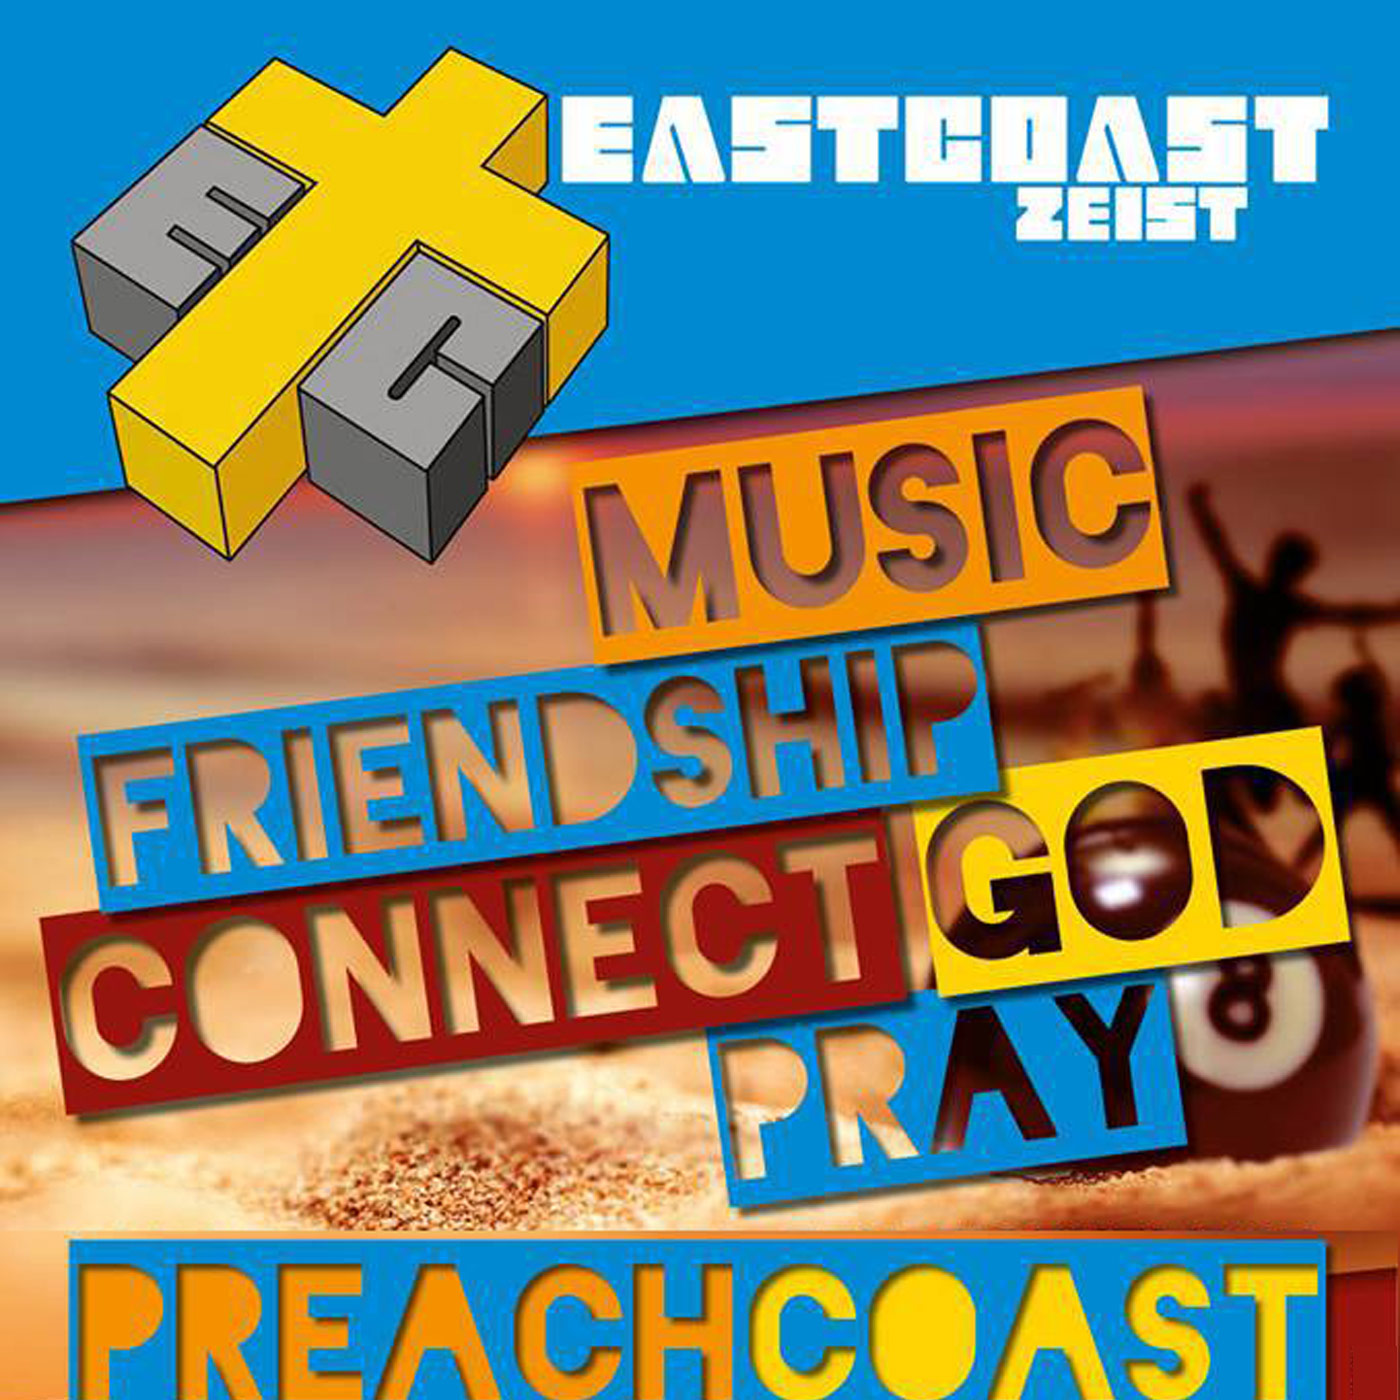 East Coast - Preach Coast